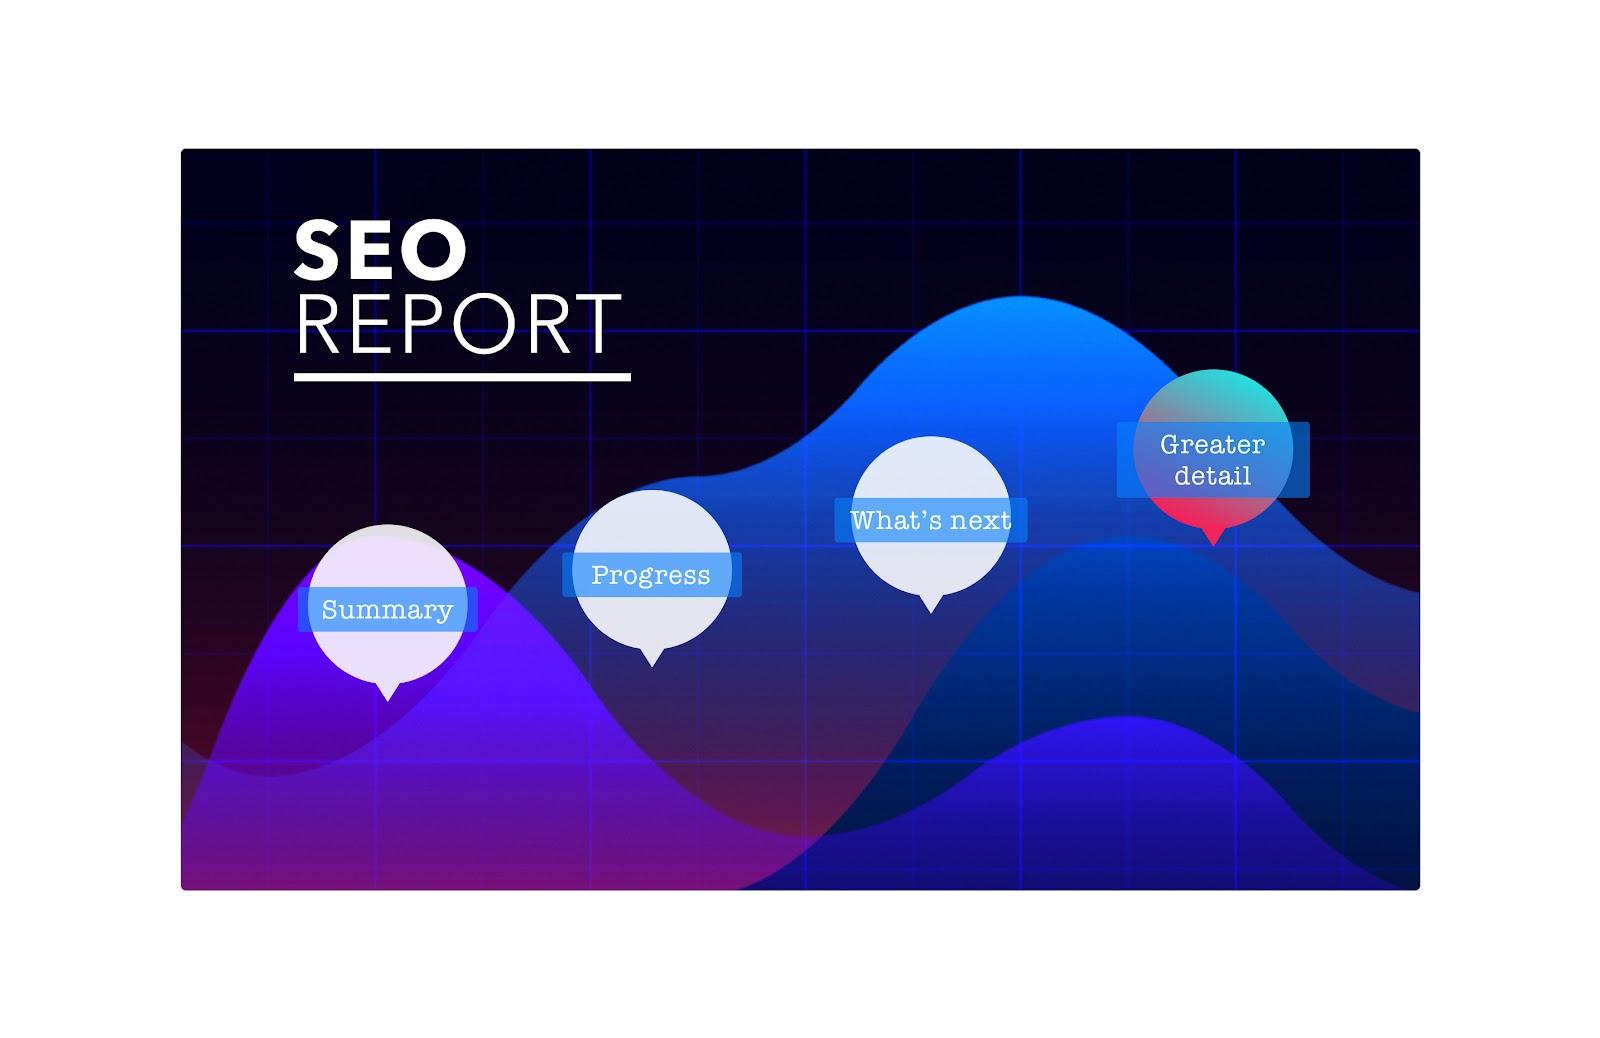 An example of an SEO report Prezi presentation.